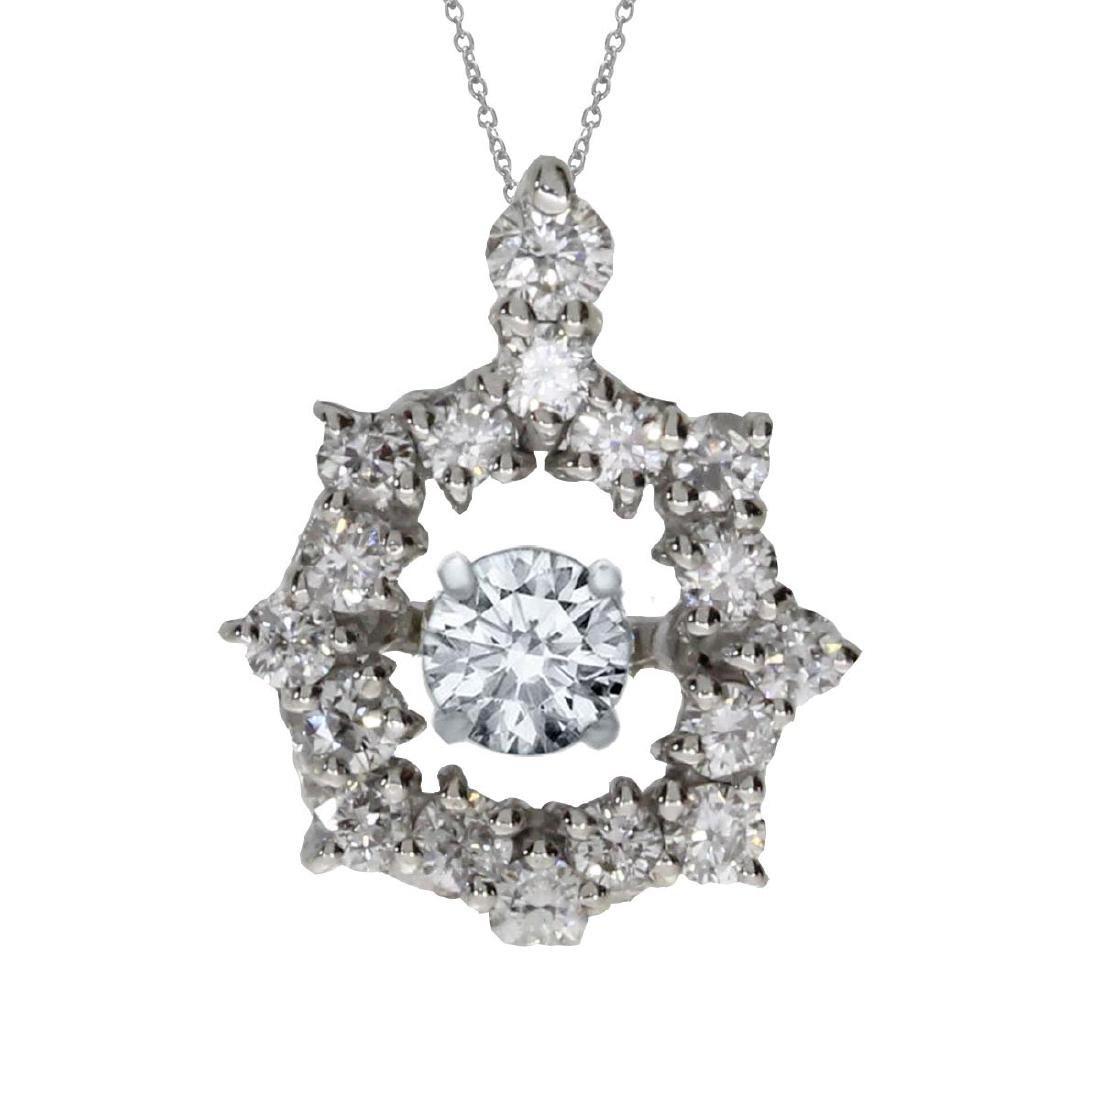 Certified 14K White Gold Diamond Dashing Diamonds Penda